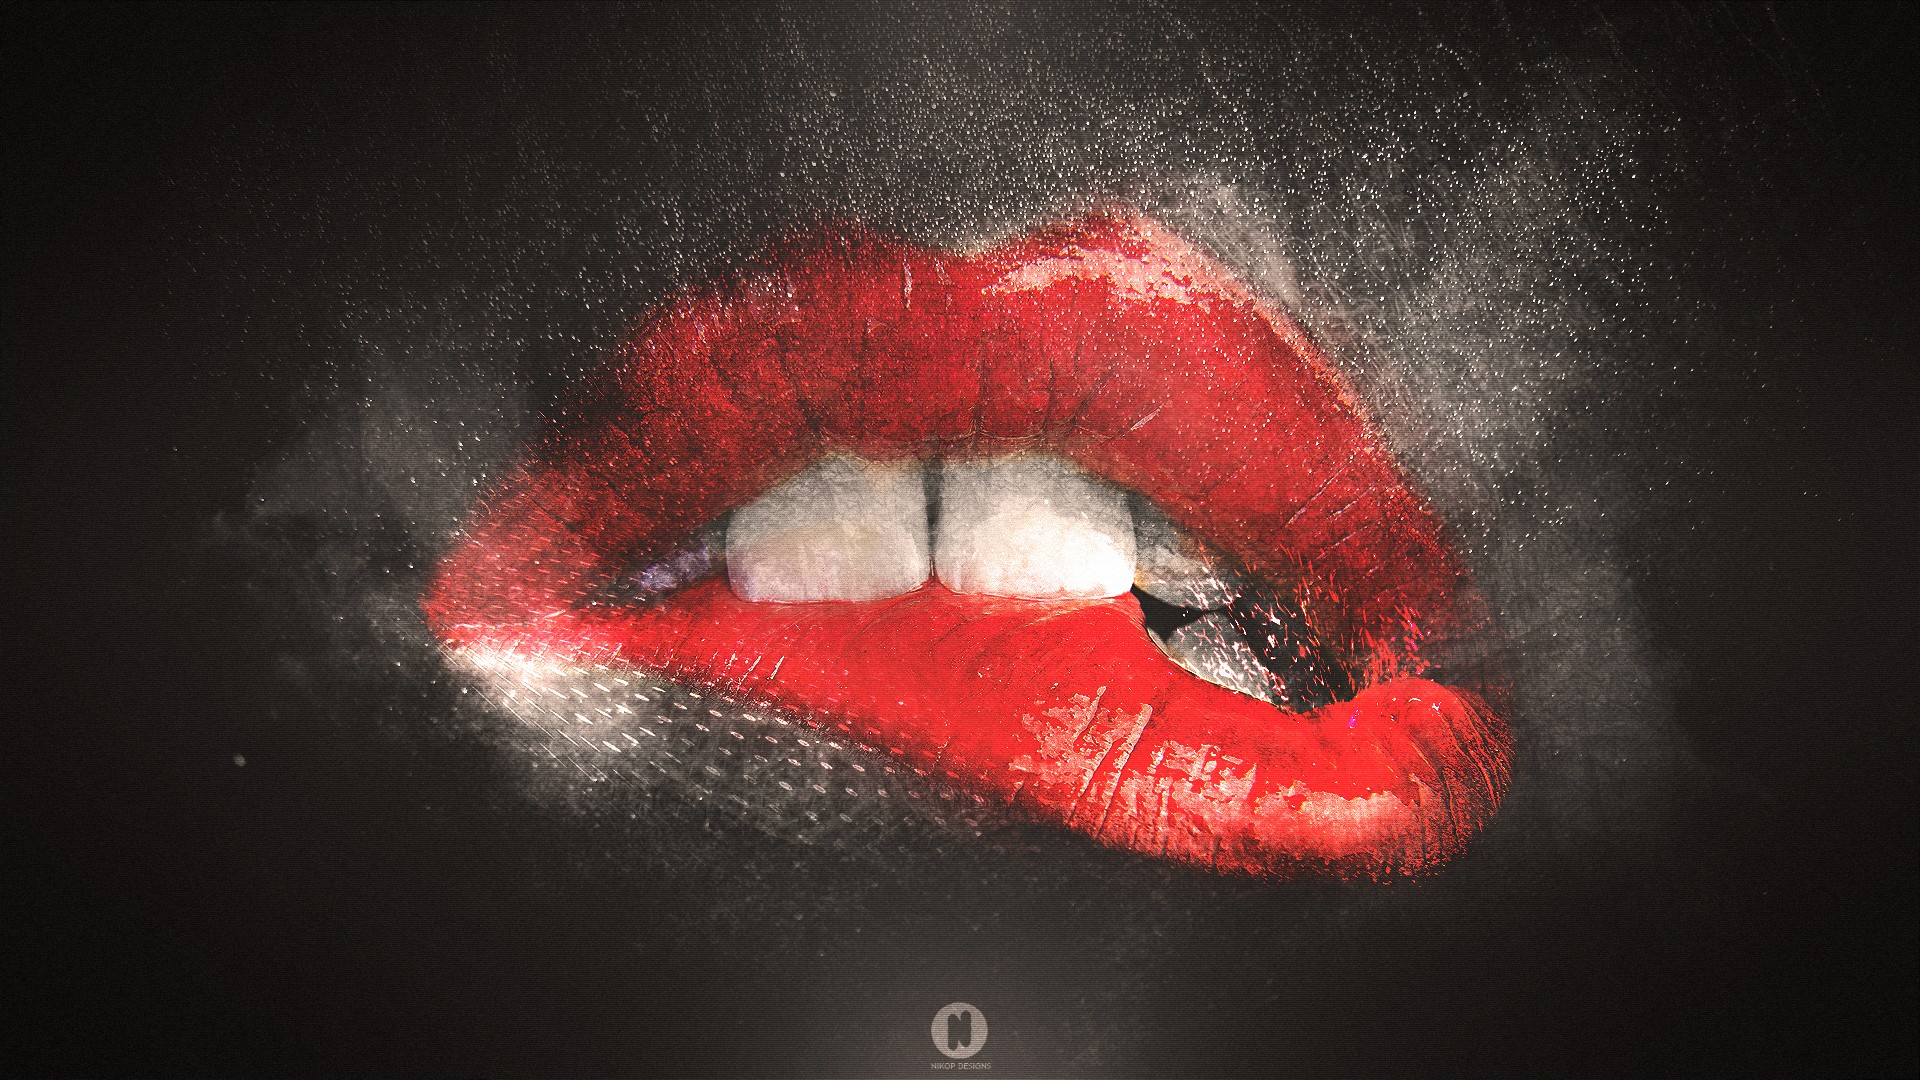 Lip biting wallpaper sexy lips bite mouth teeth wallpapers erotic 1920x1080